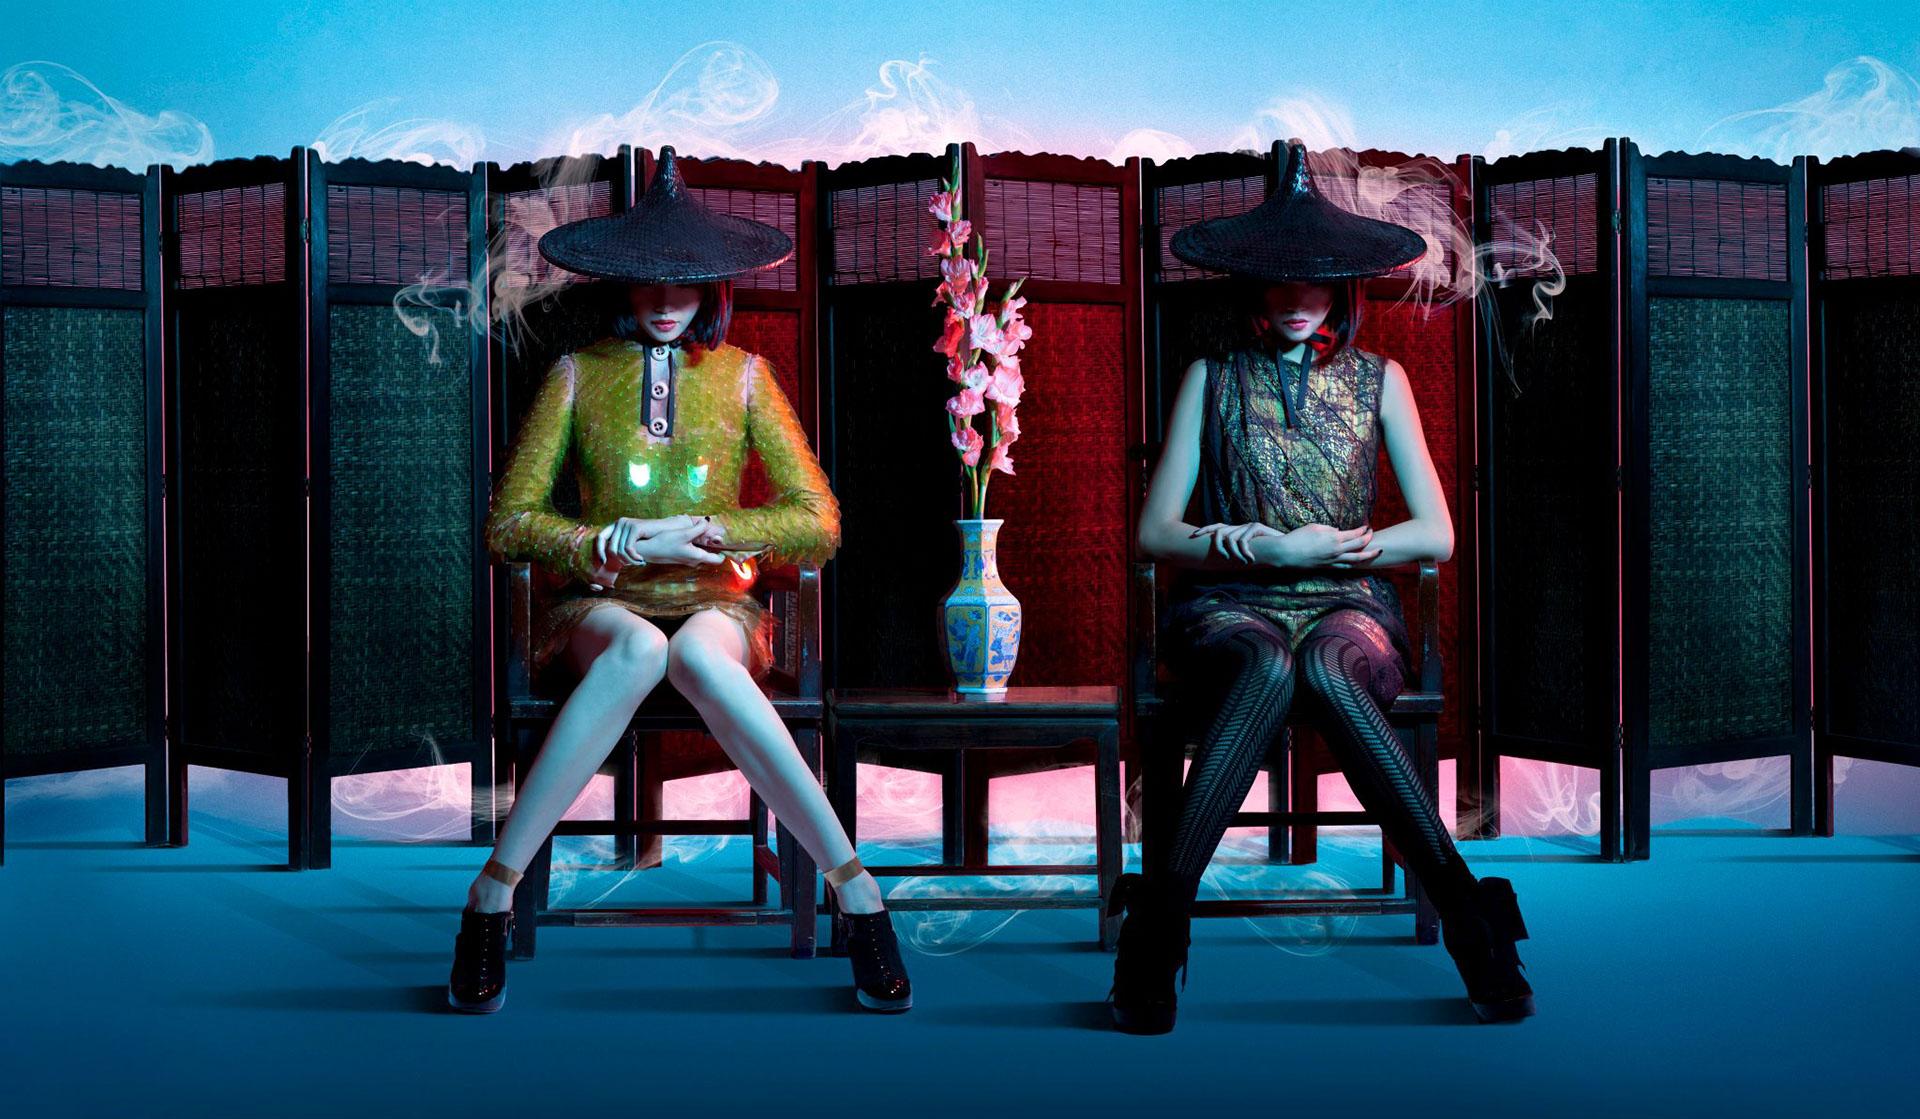 Гламурный гладиолус - The Gladiolus Glamour by Kelly & Kwokin